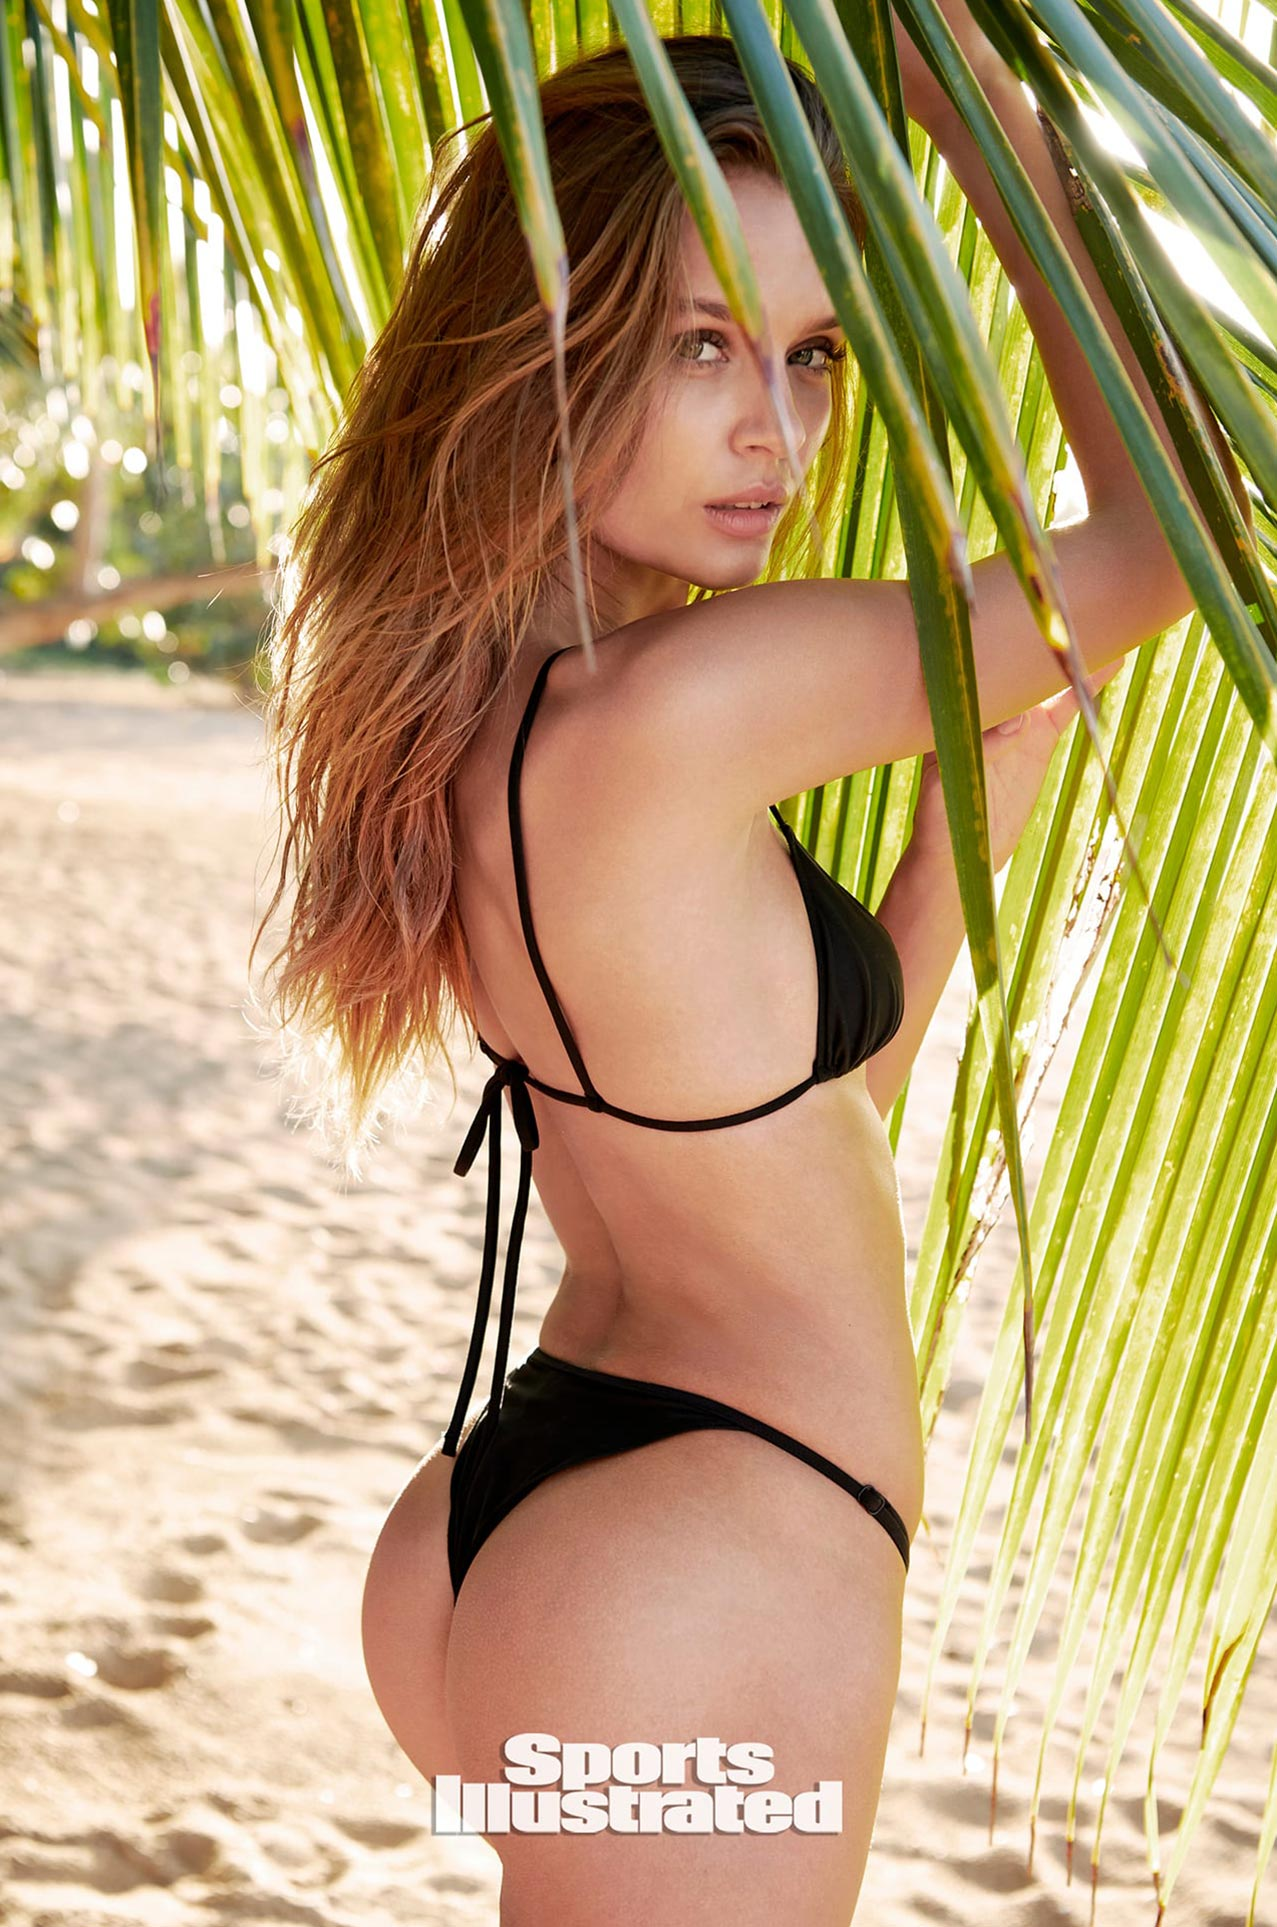 Жозефин Скривер в каталоге купальников Sports Illustrated Swimsuit 2020 / фото 18